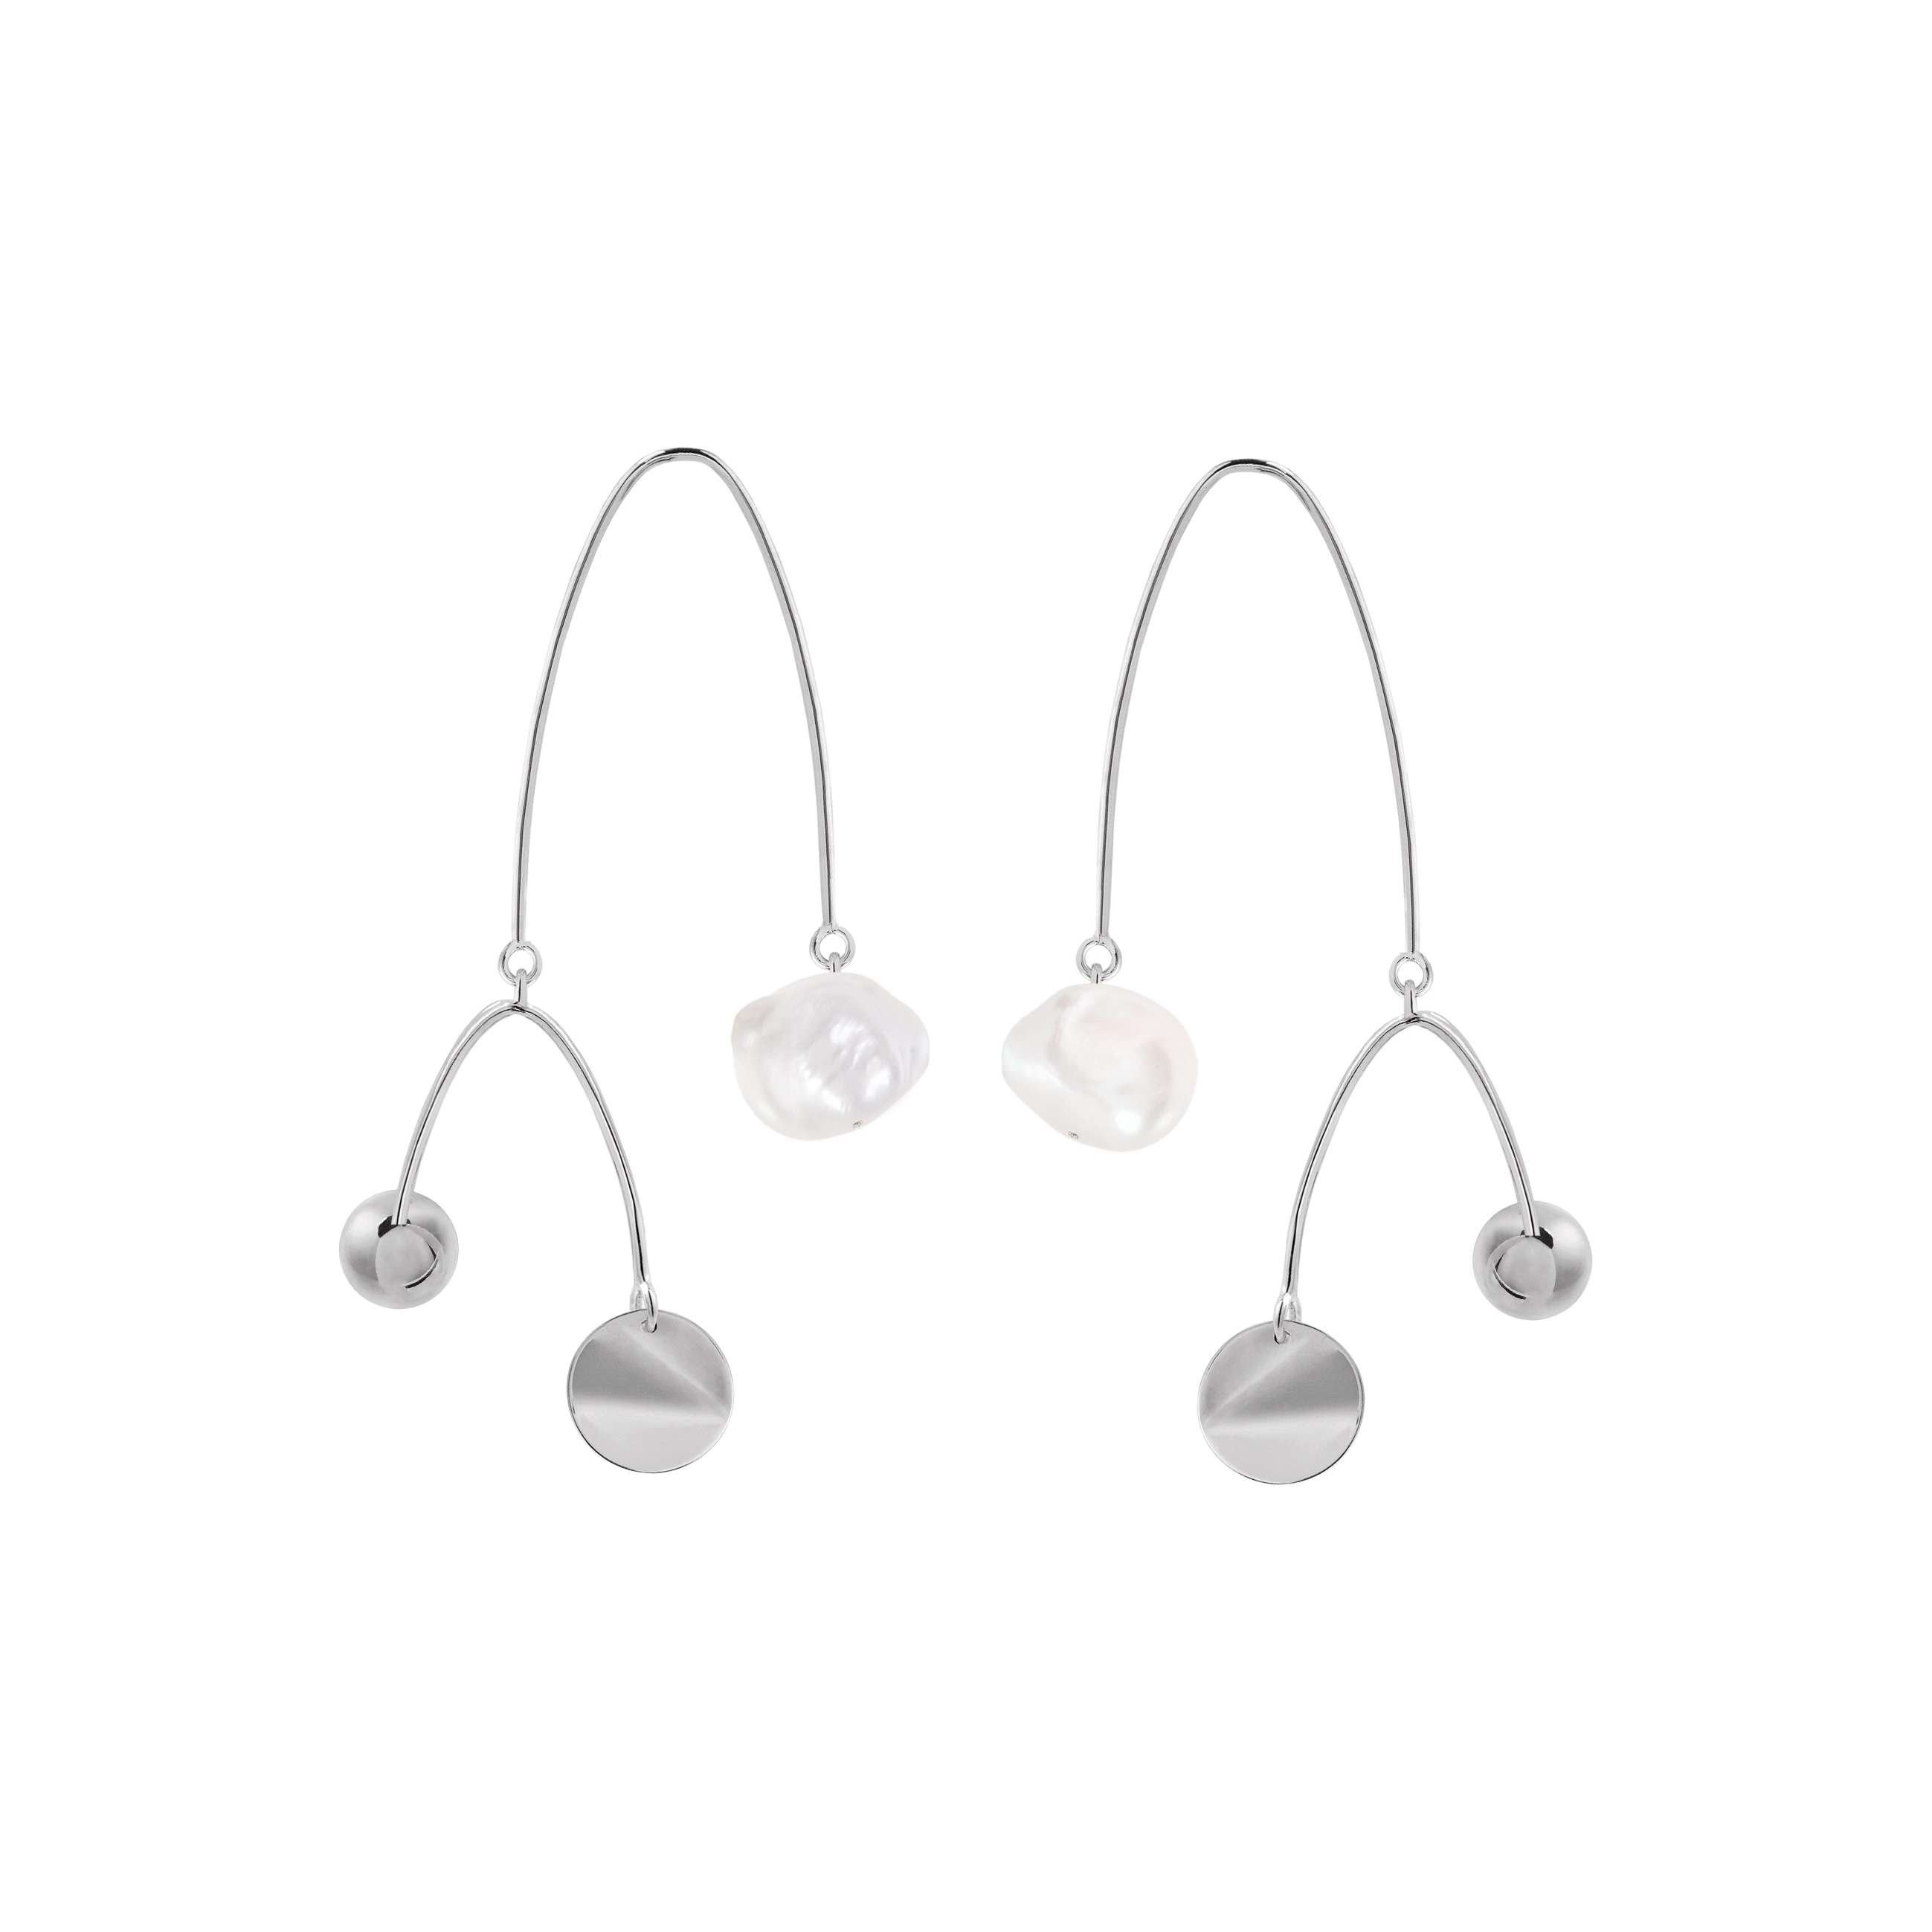 Mobile Earrings 1 Silver